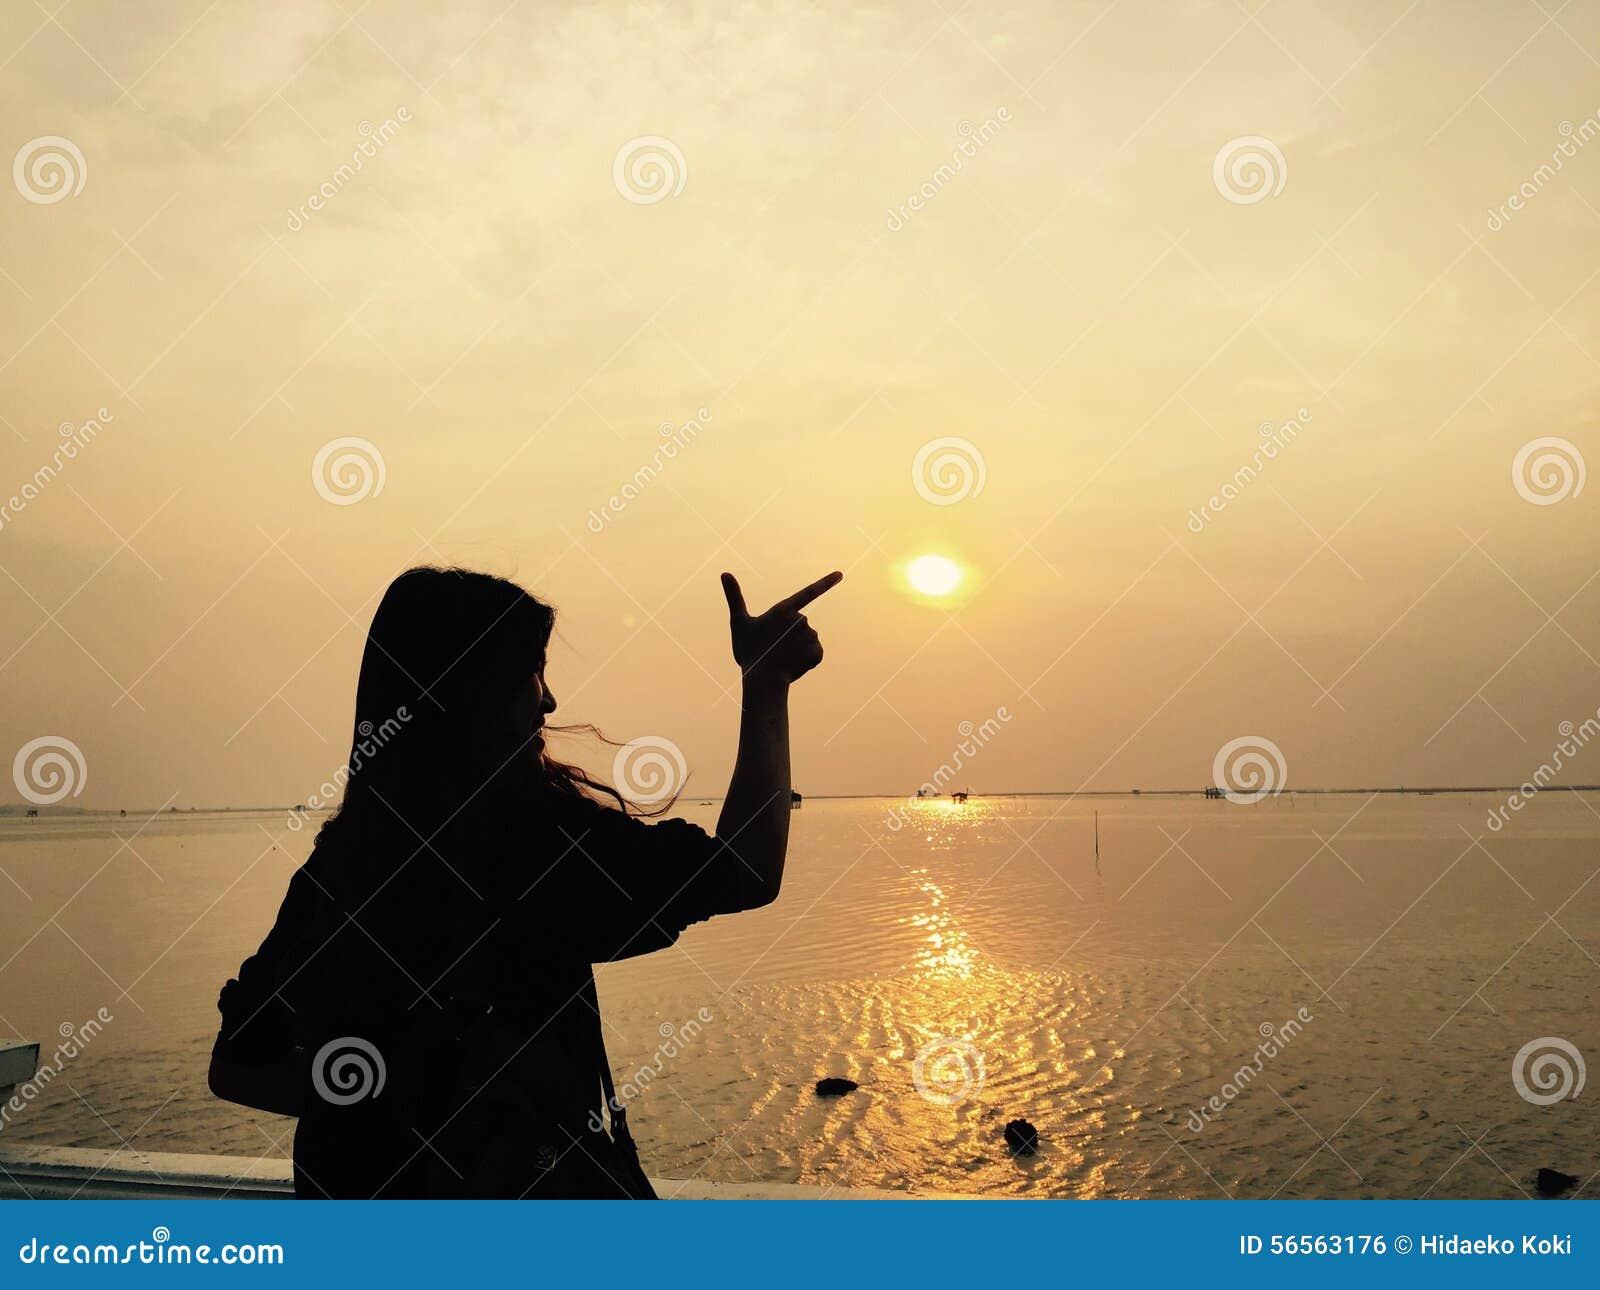 Download επεξεργασμένο καλυμμένο σκηνή ηλιοβασίλεμα έκθεσης Hdr πολύ Εκδοτική Εικόνες - εικόνα από βράδυ, ηλιοβασίλεμα: 56563176